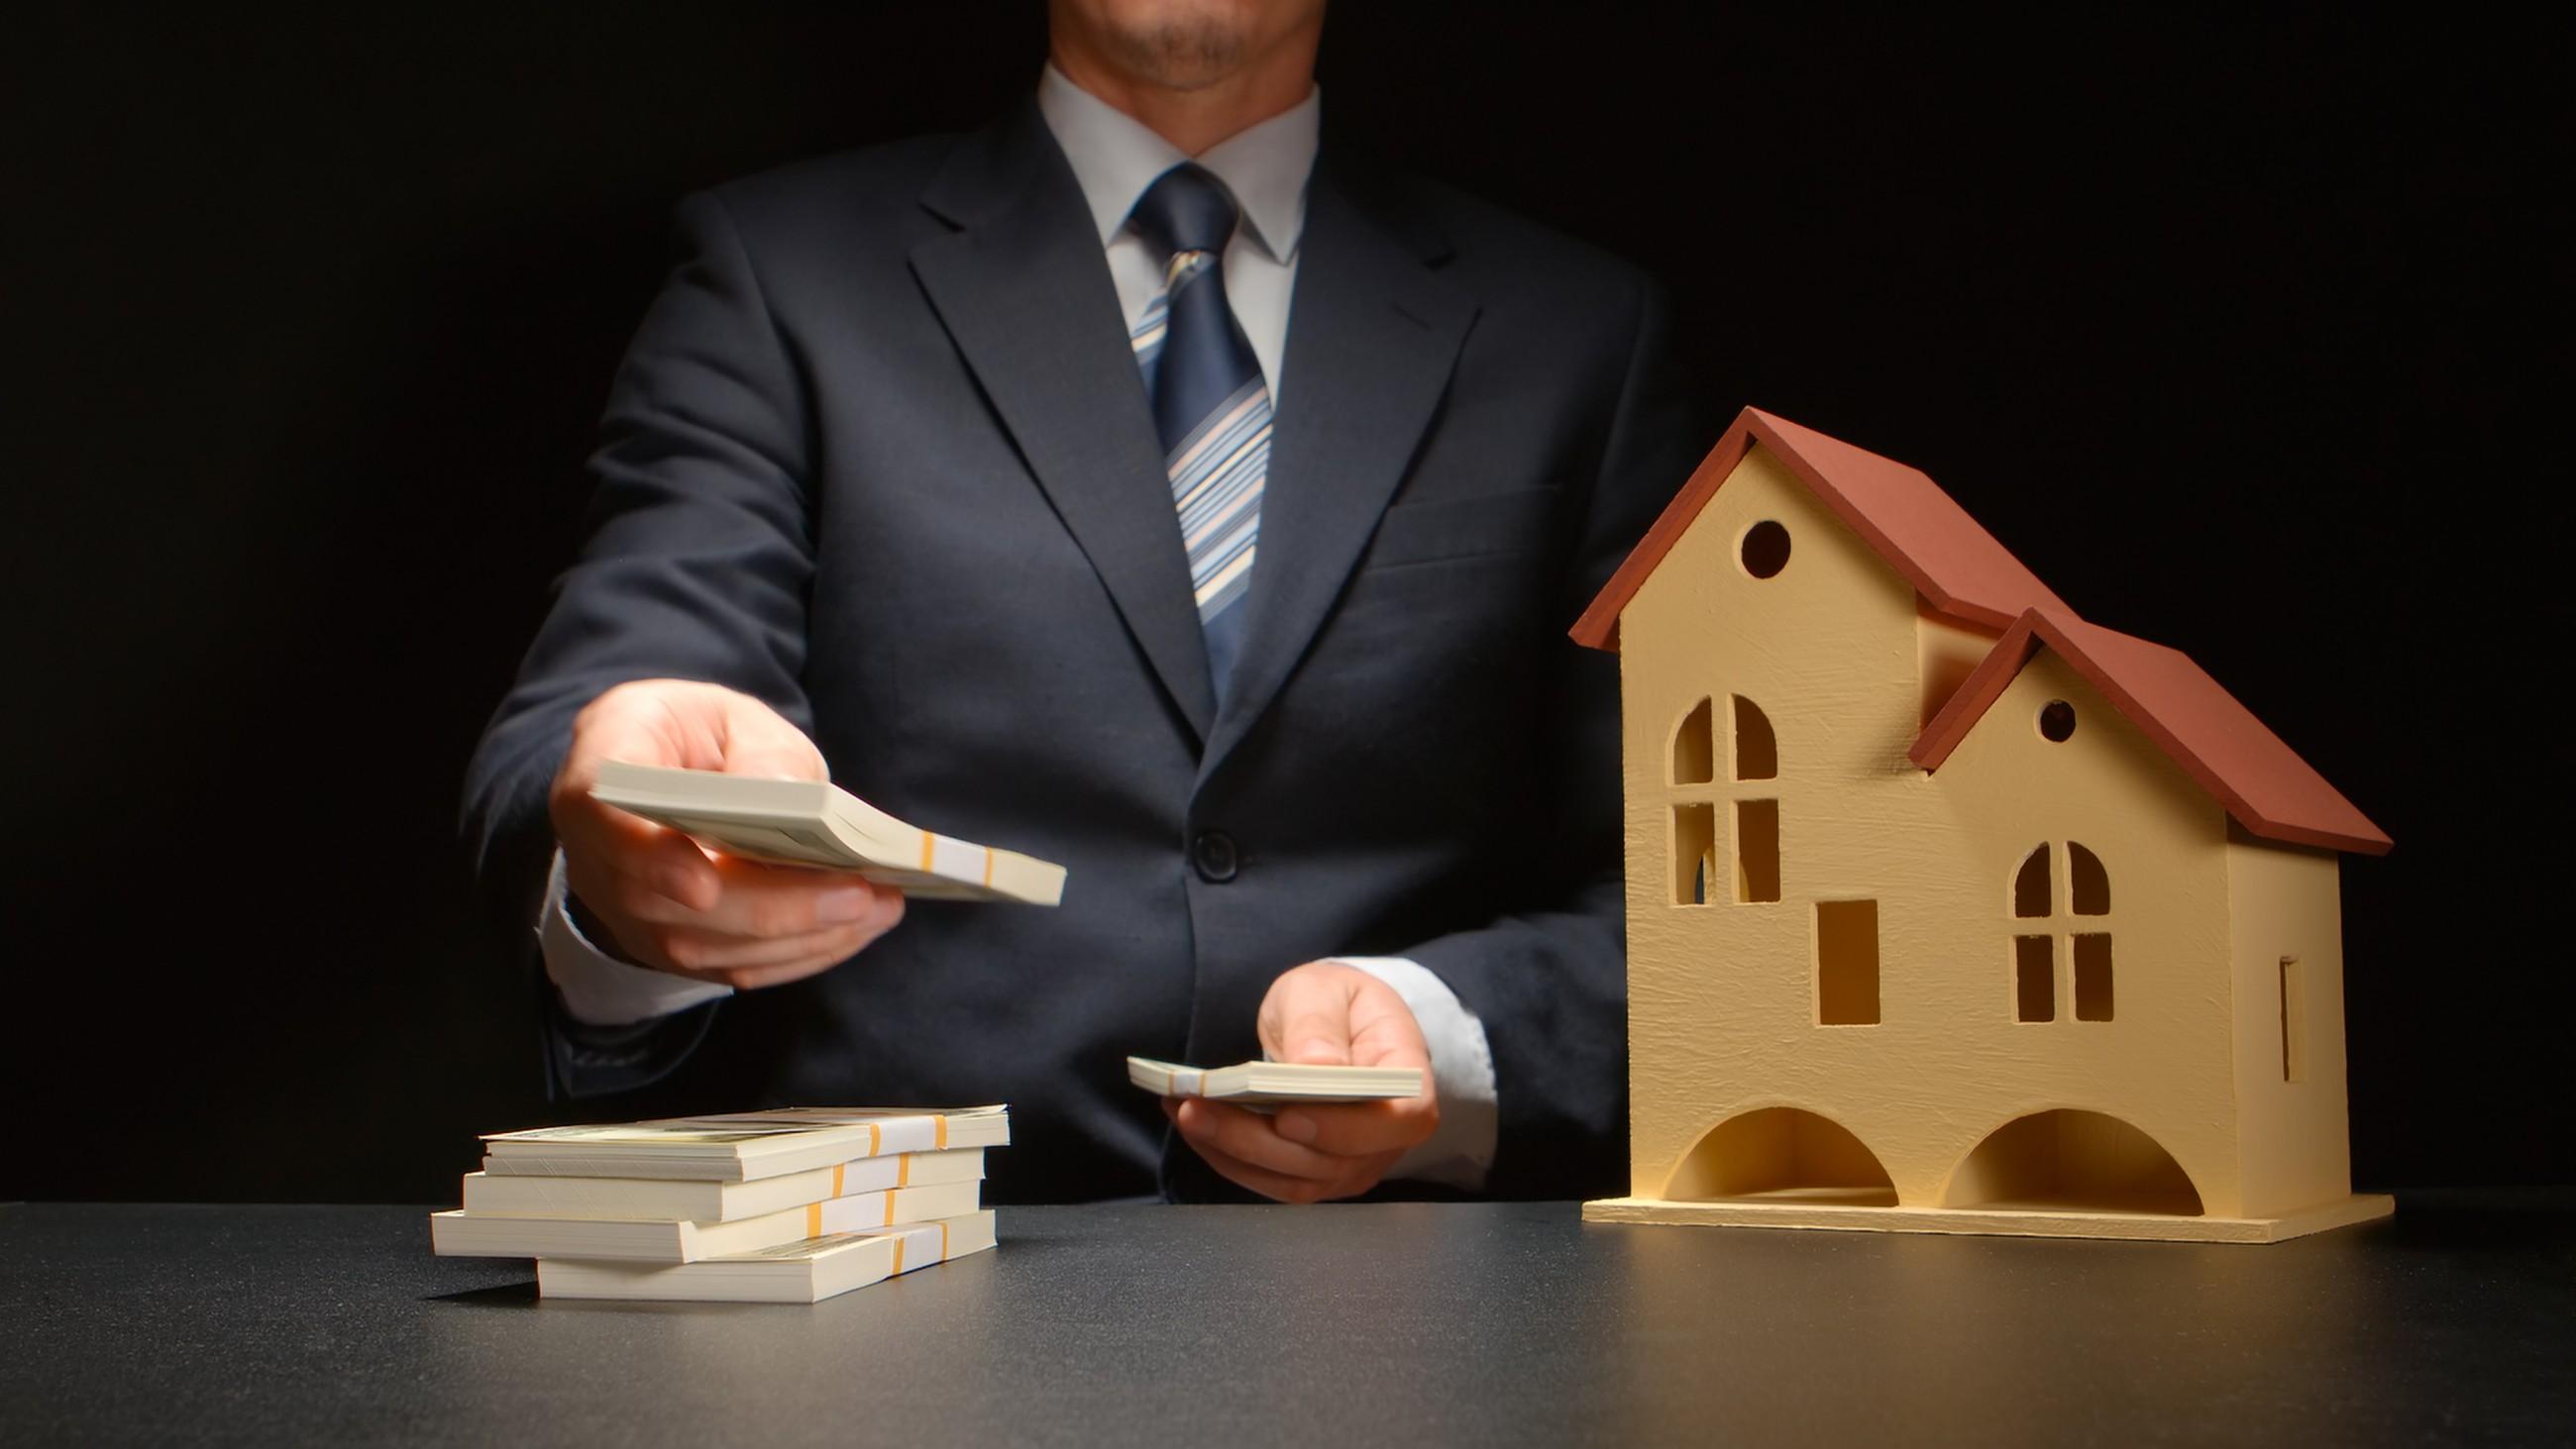 возьму кредит под залог недвижимости